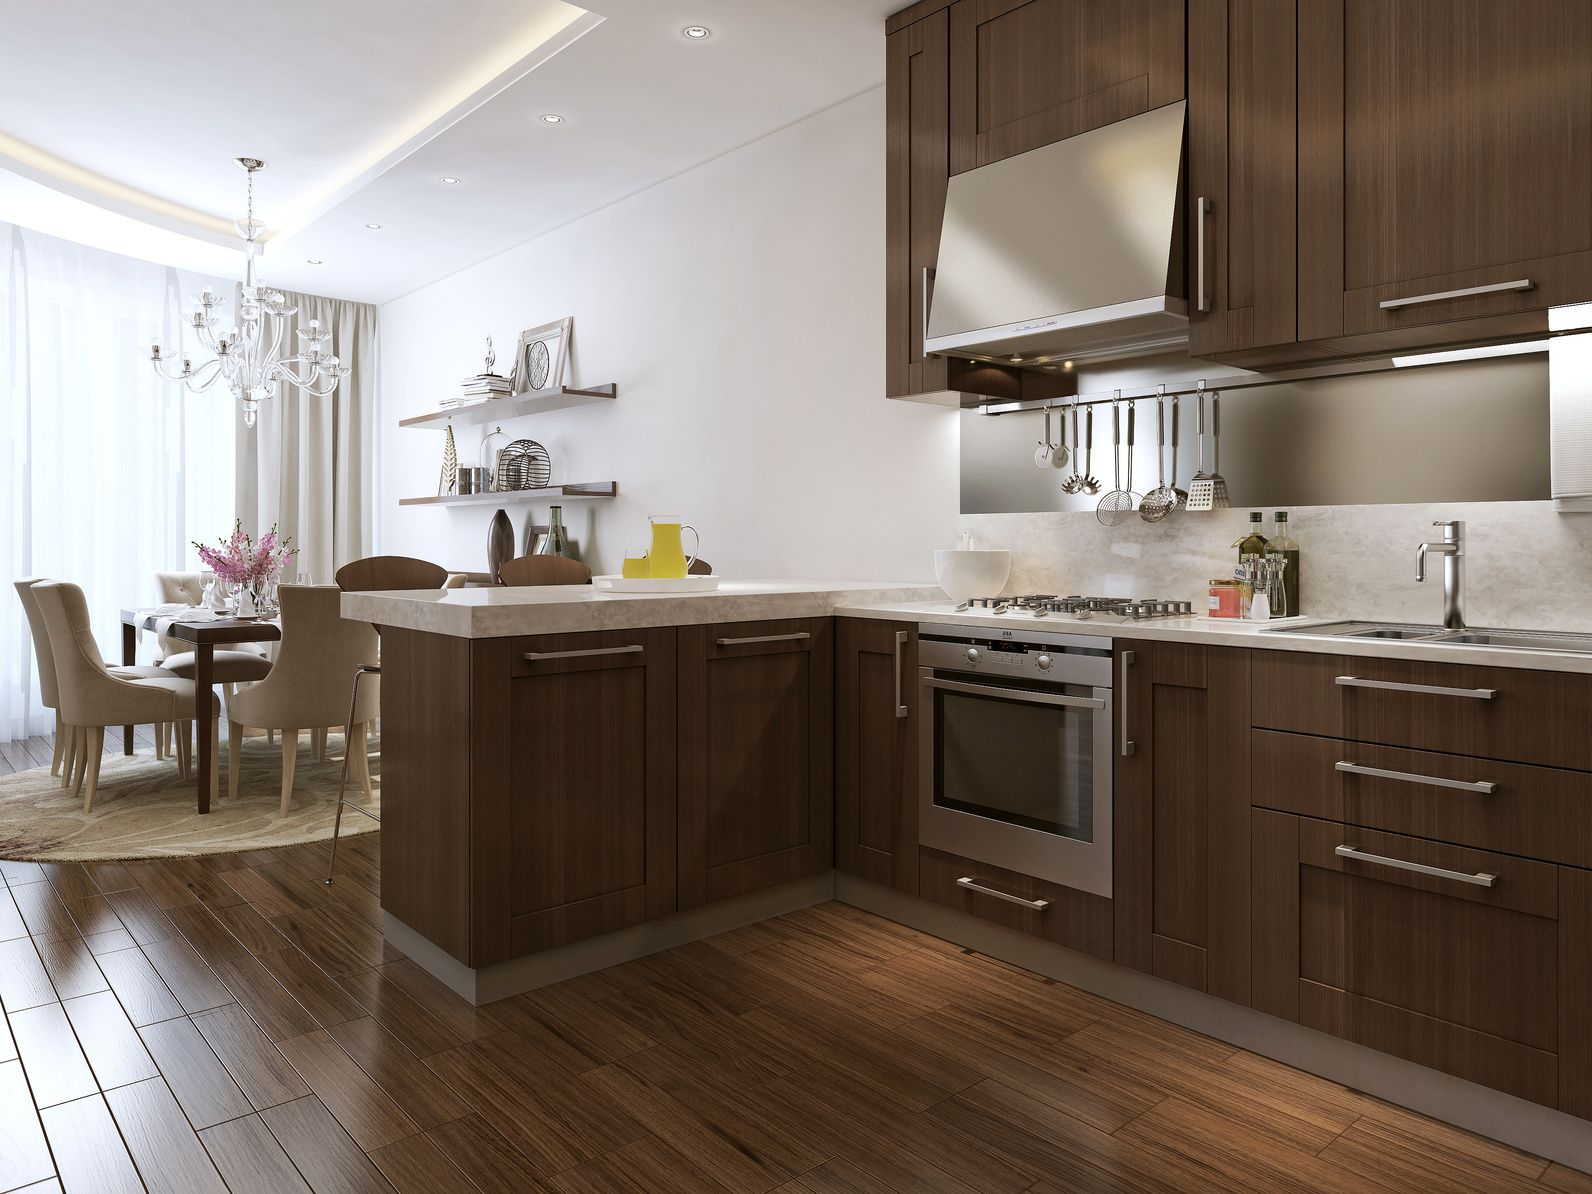 Offene Wohnküchen dunkle offene wohnküche offene wohnküchen offene